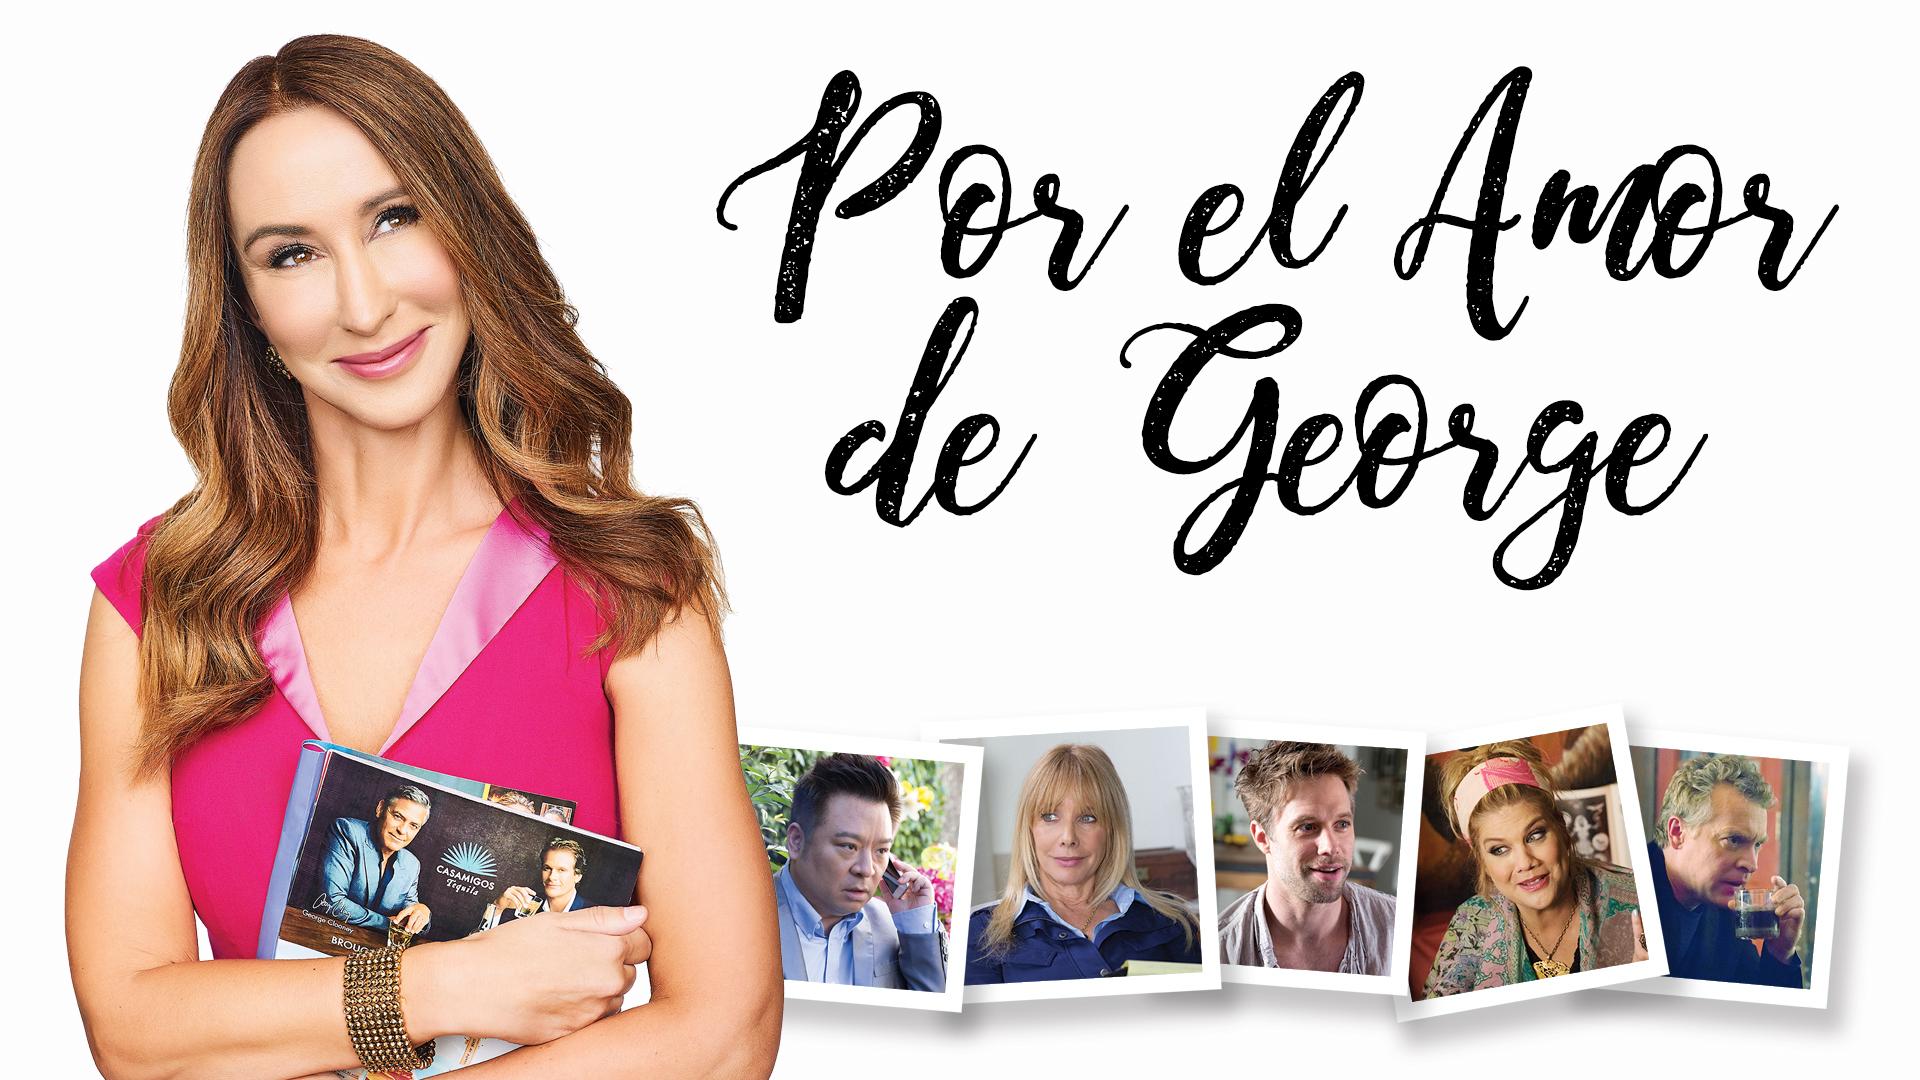 Por el amor de George (Spanish For the Love of George)